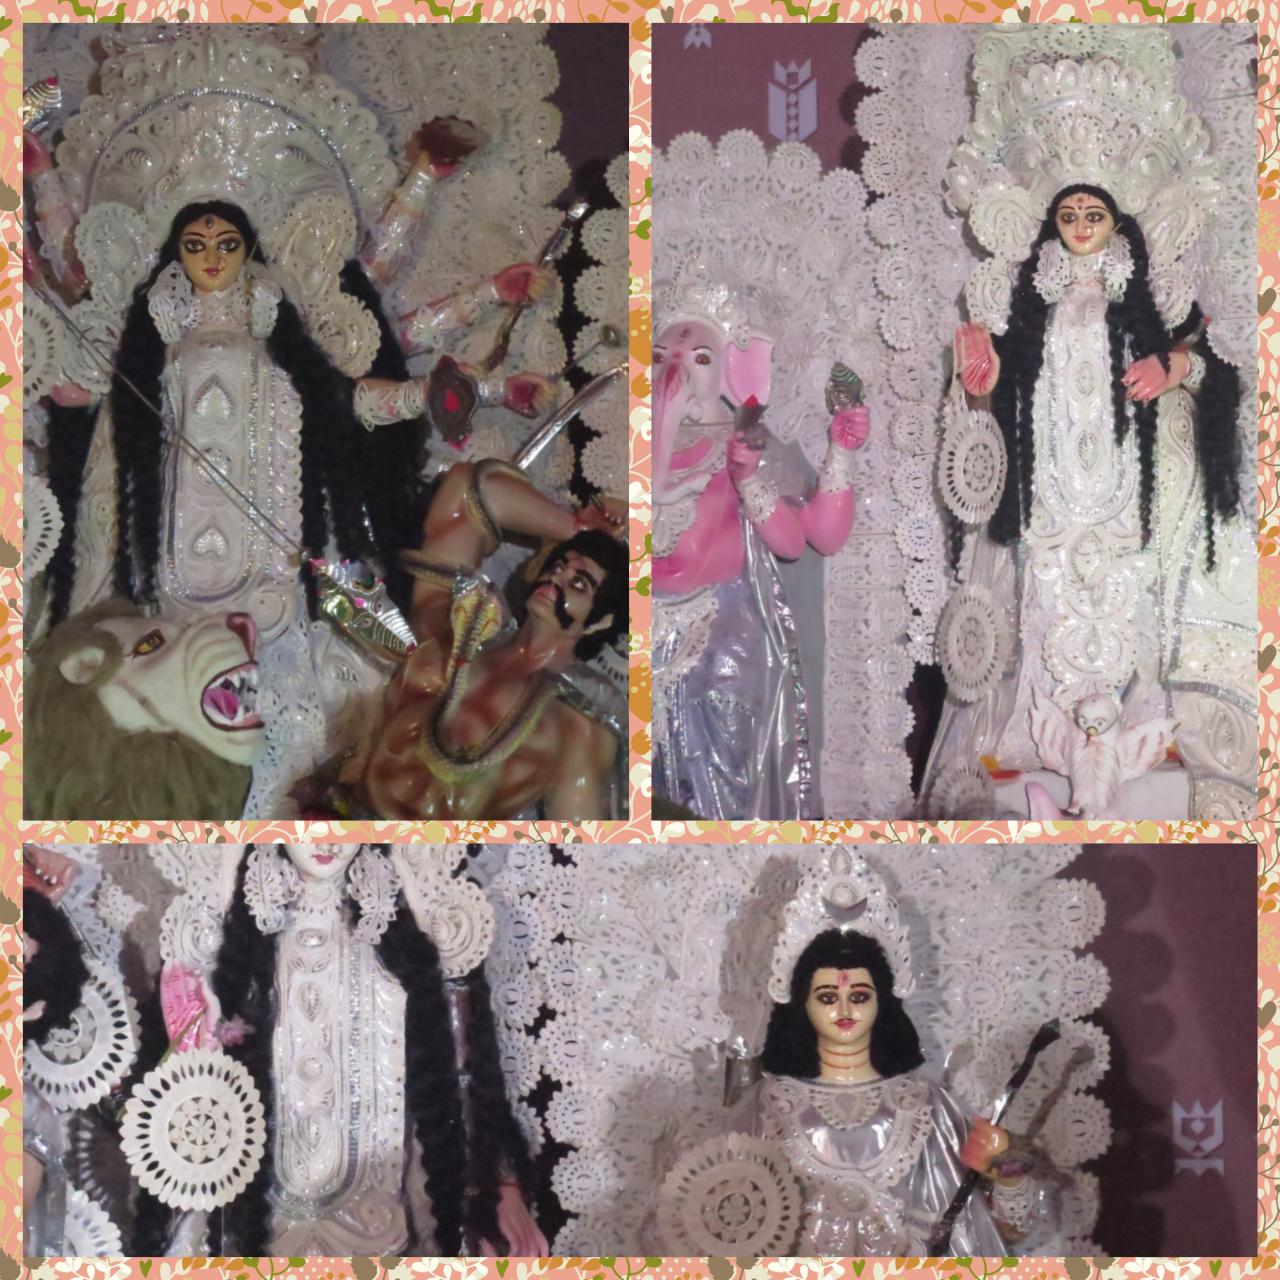 A closer look at the idols of Durga, Ganesh, Saraswati, Lakshmi and Kartikeya